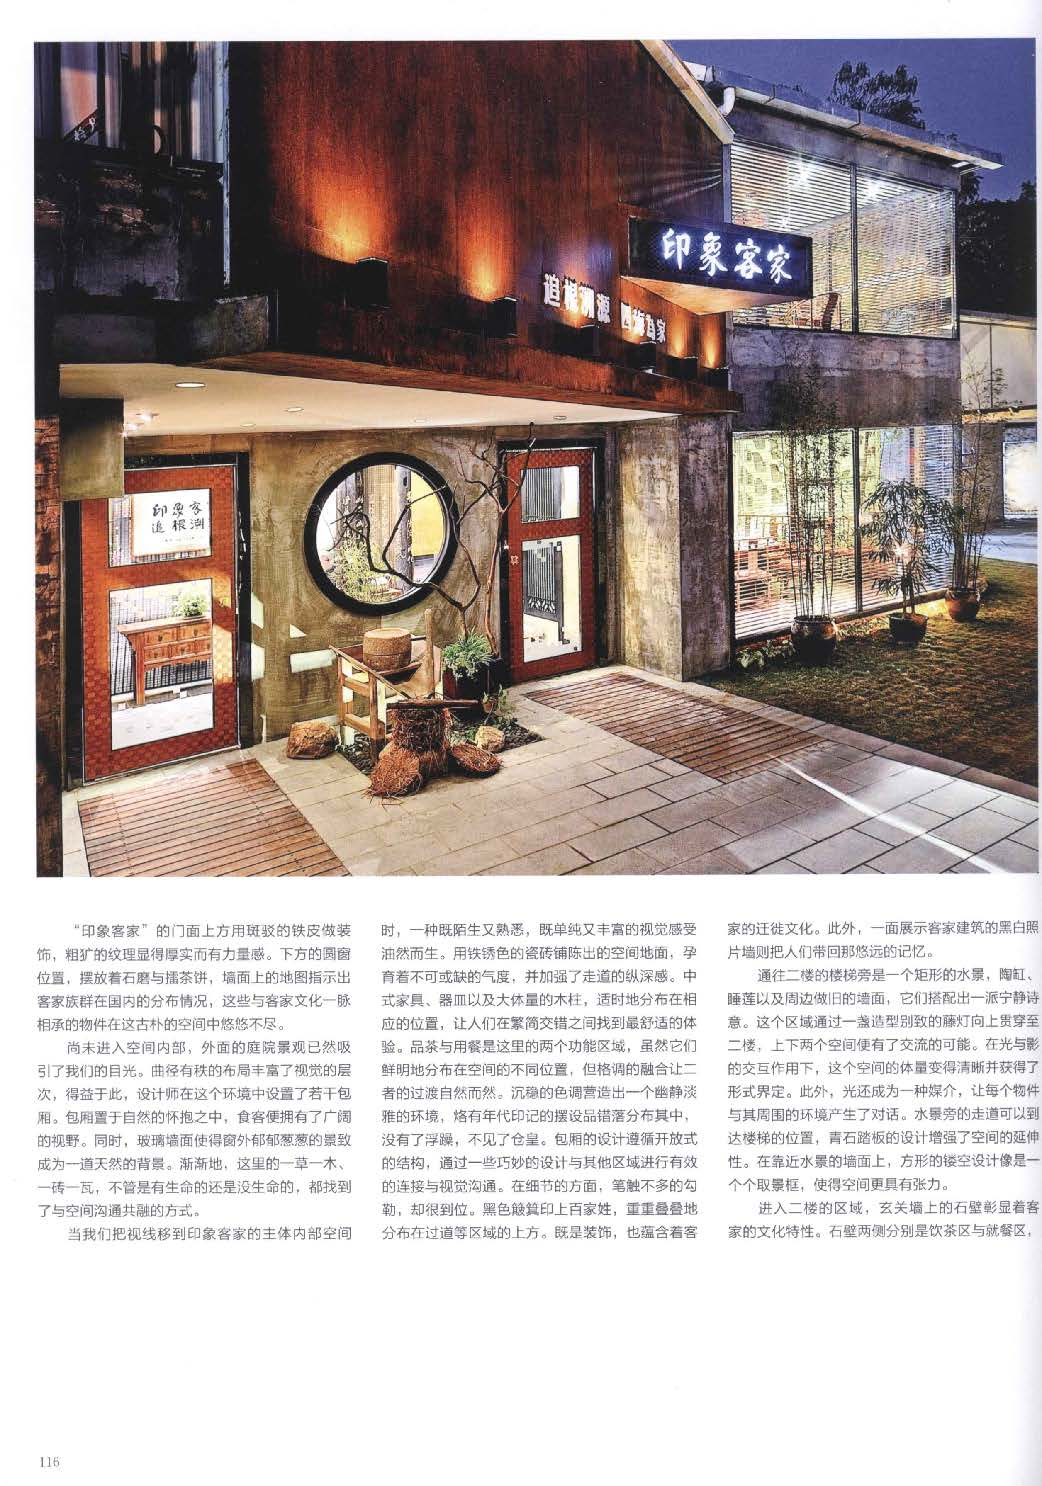 H073 东方风情 会所、餐饮细部解析_Page_114.jpg